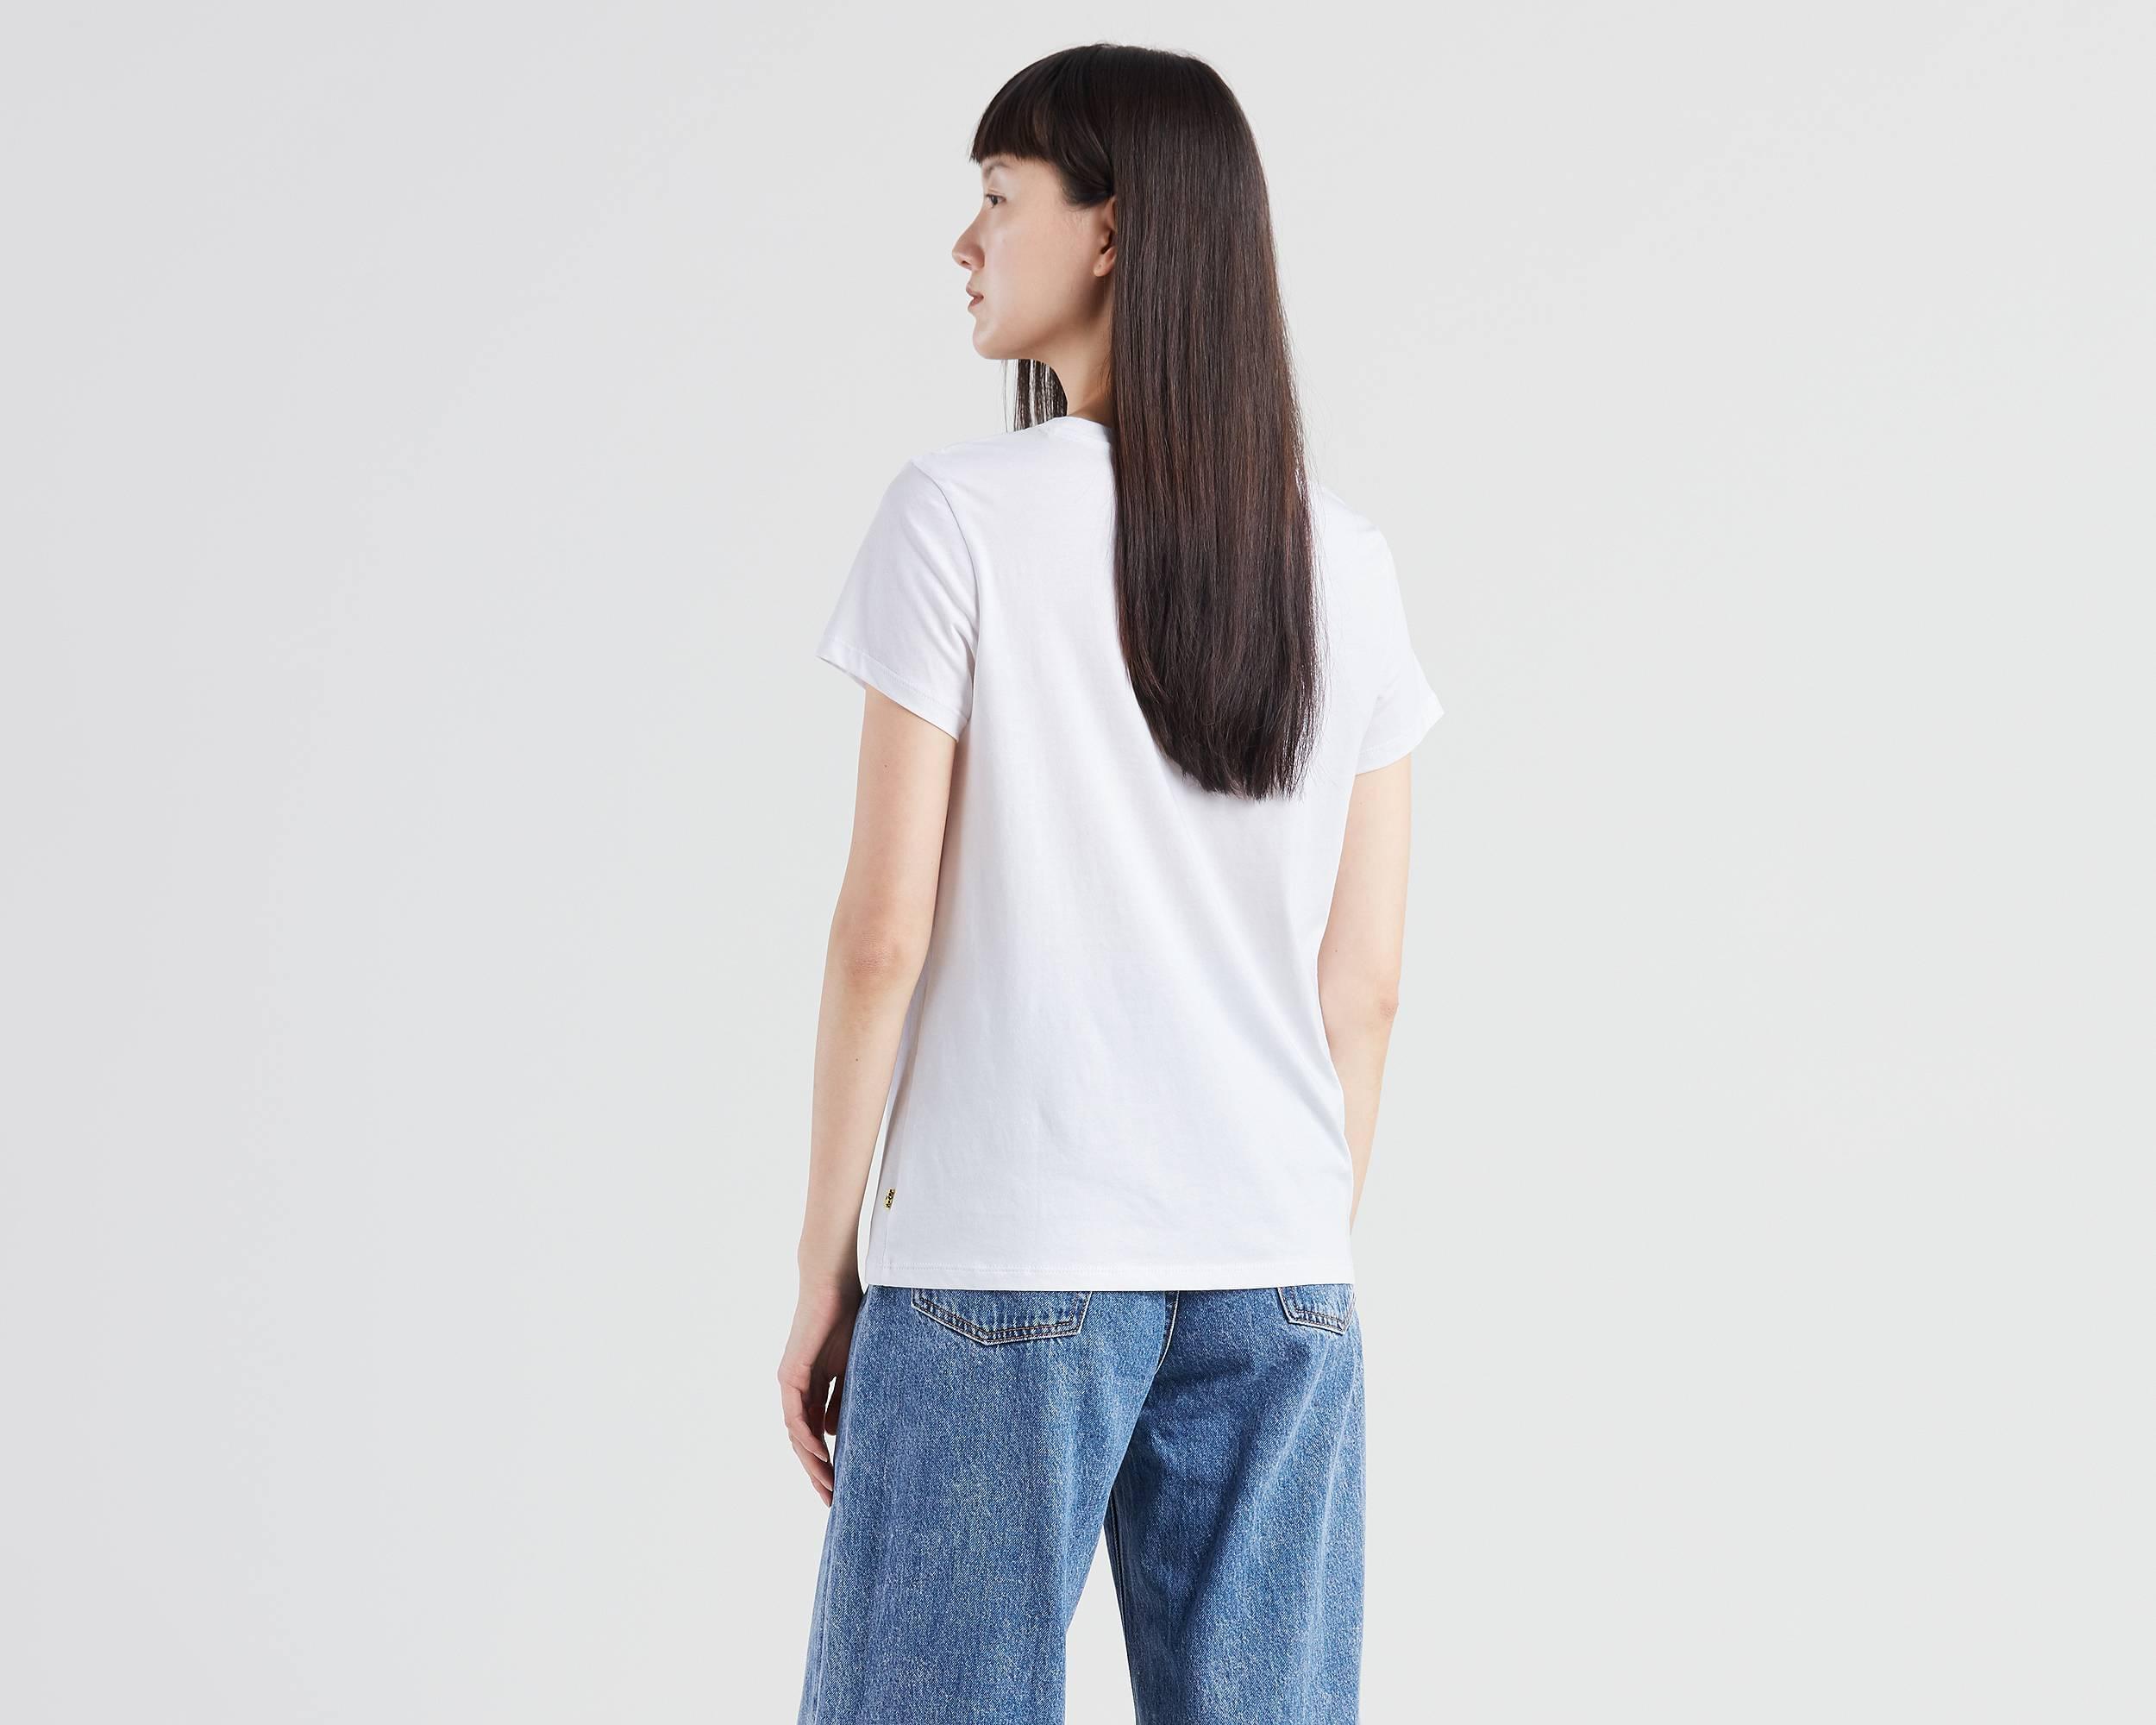 e1e1d33b2 Levi's® X Peanuts Perfect Graphic Tee - Levi's Jeans, Jackets & Clothing